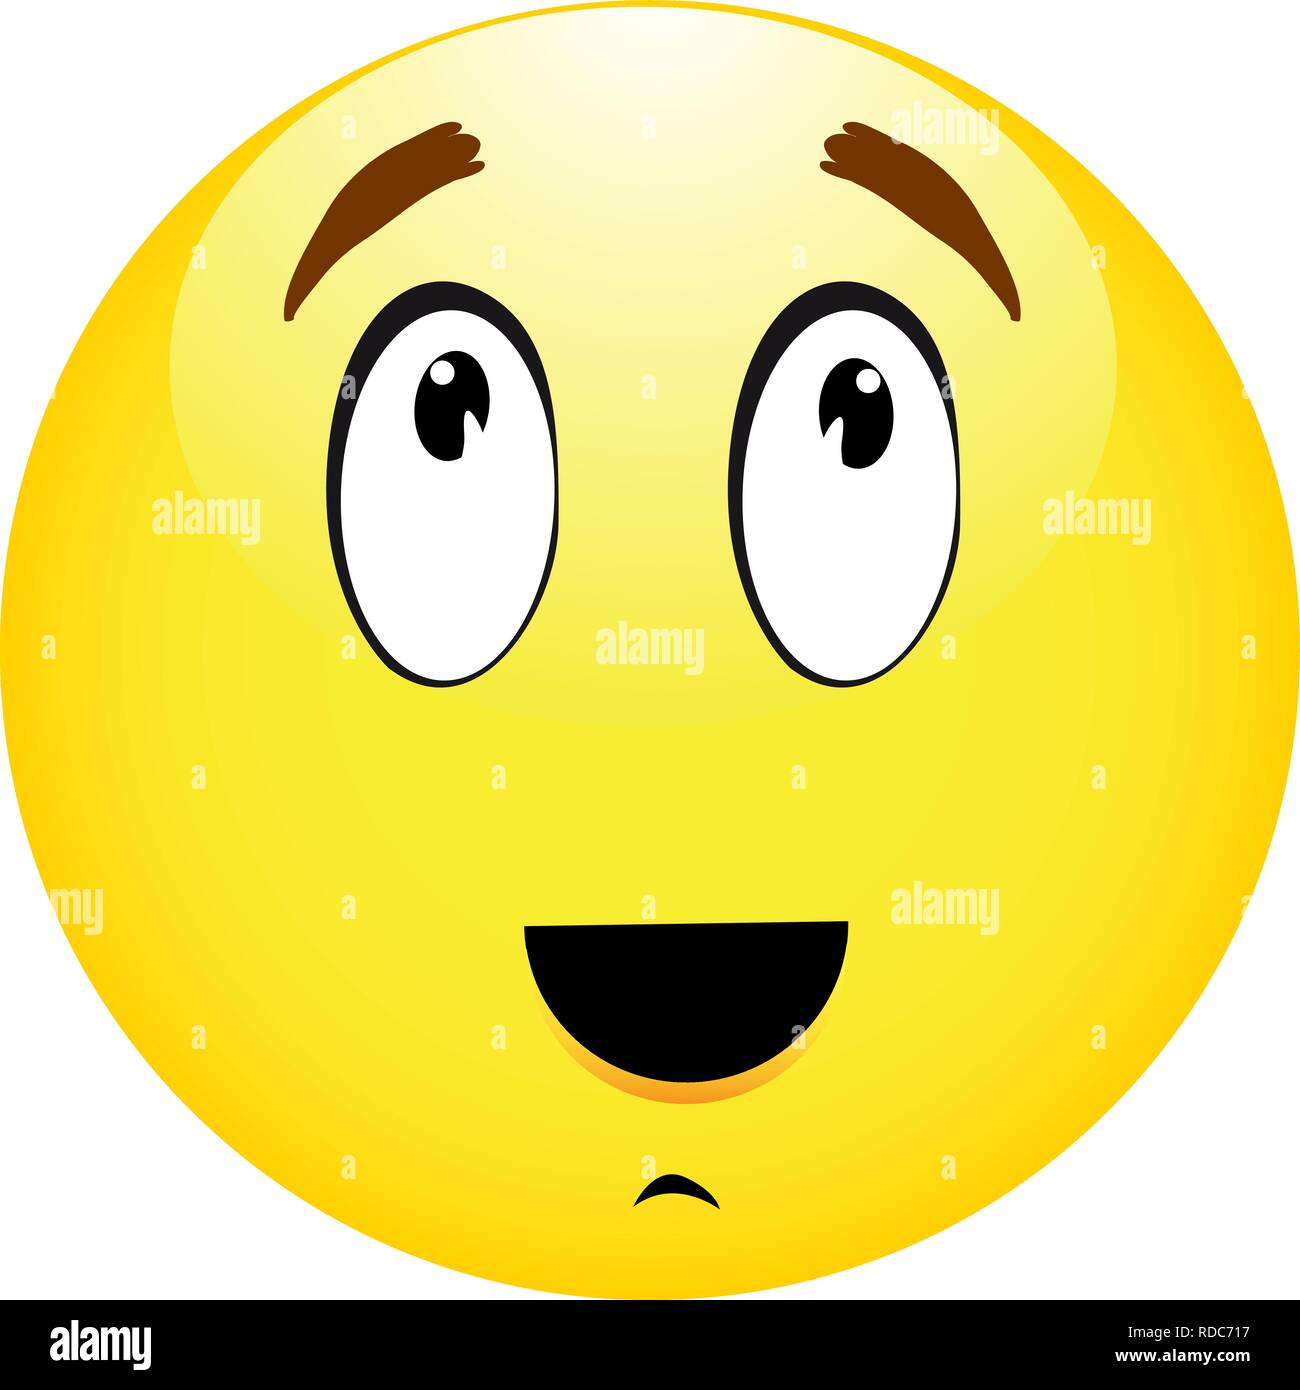 Thinking emoticon yellow smiley on white backround - Stock Vector